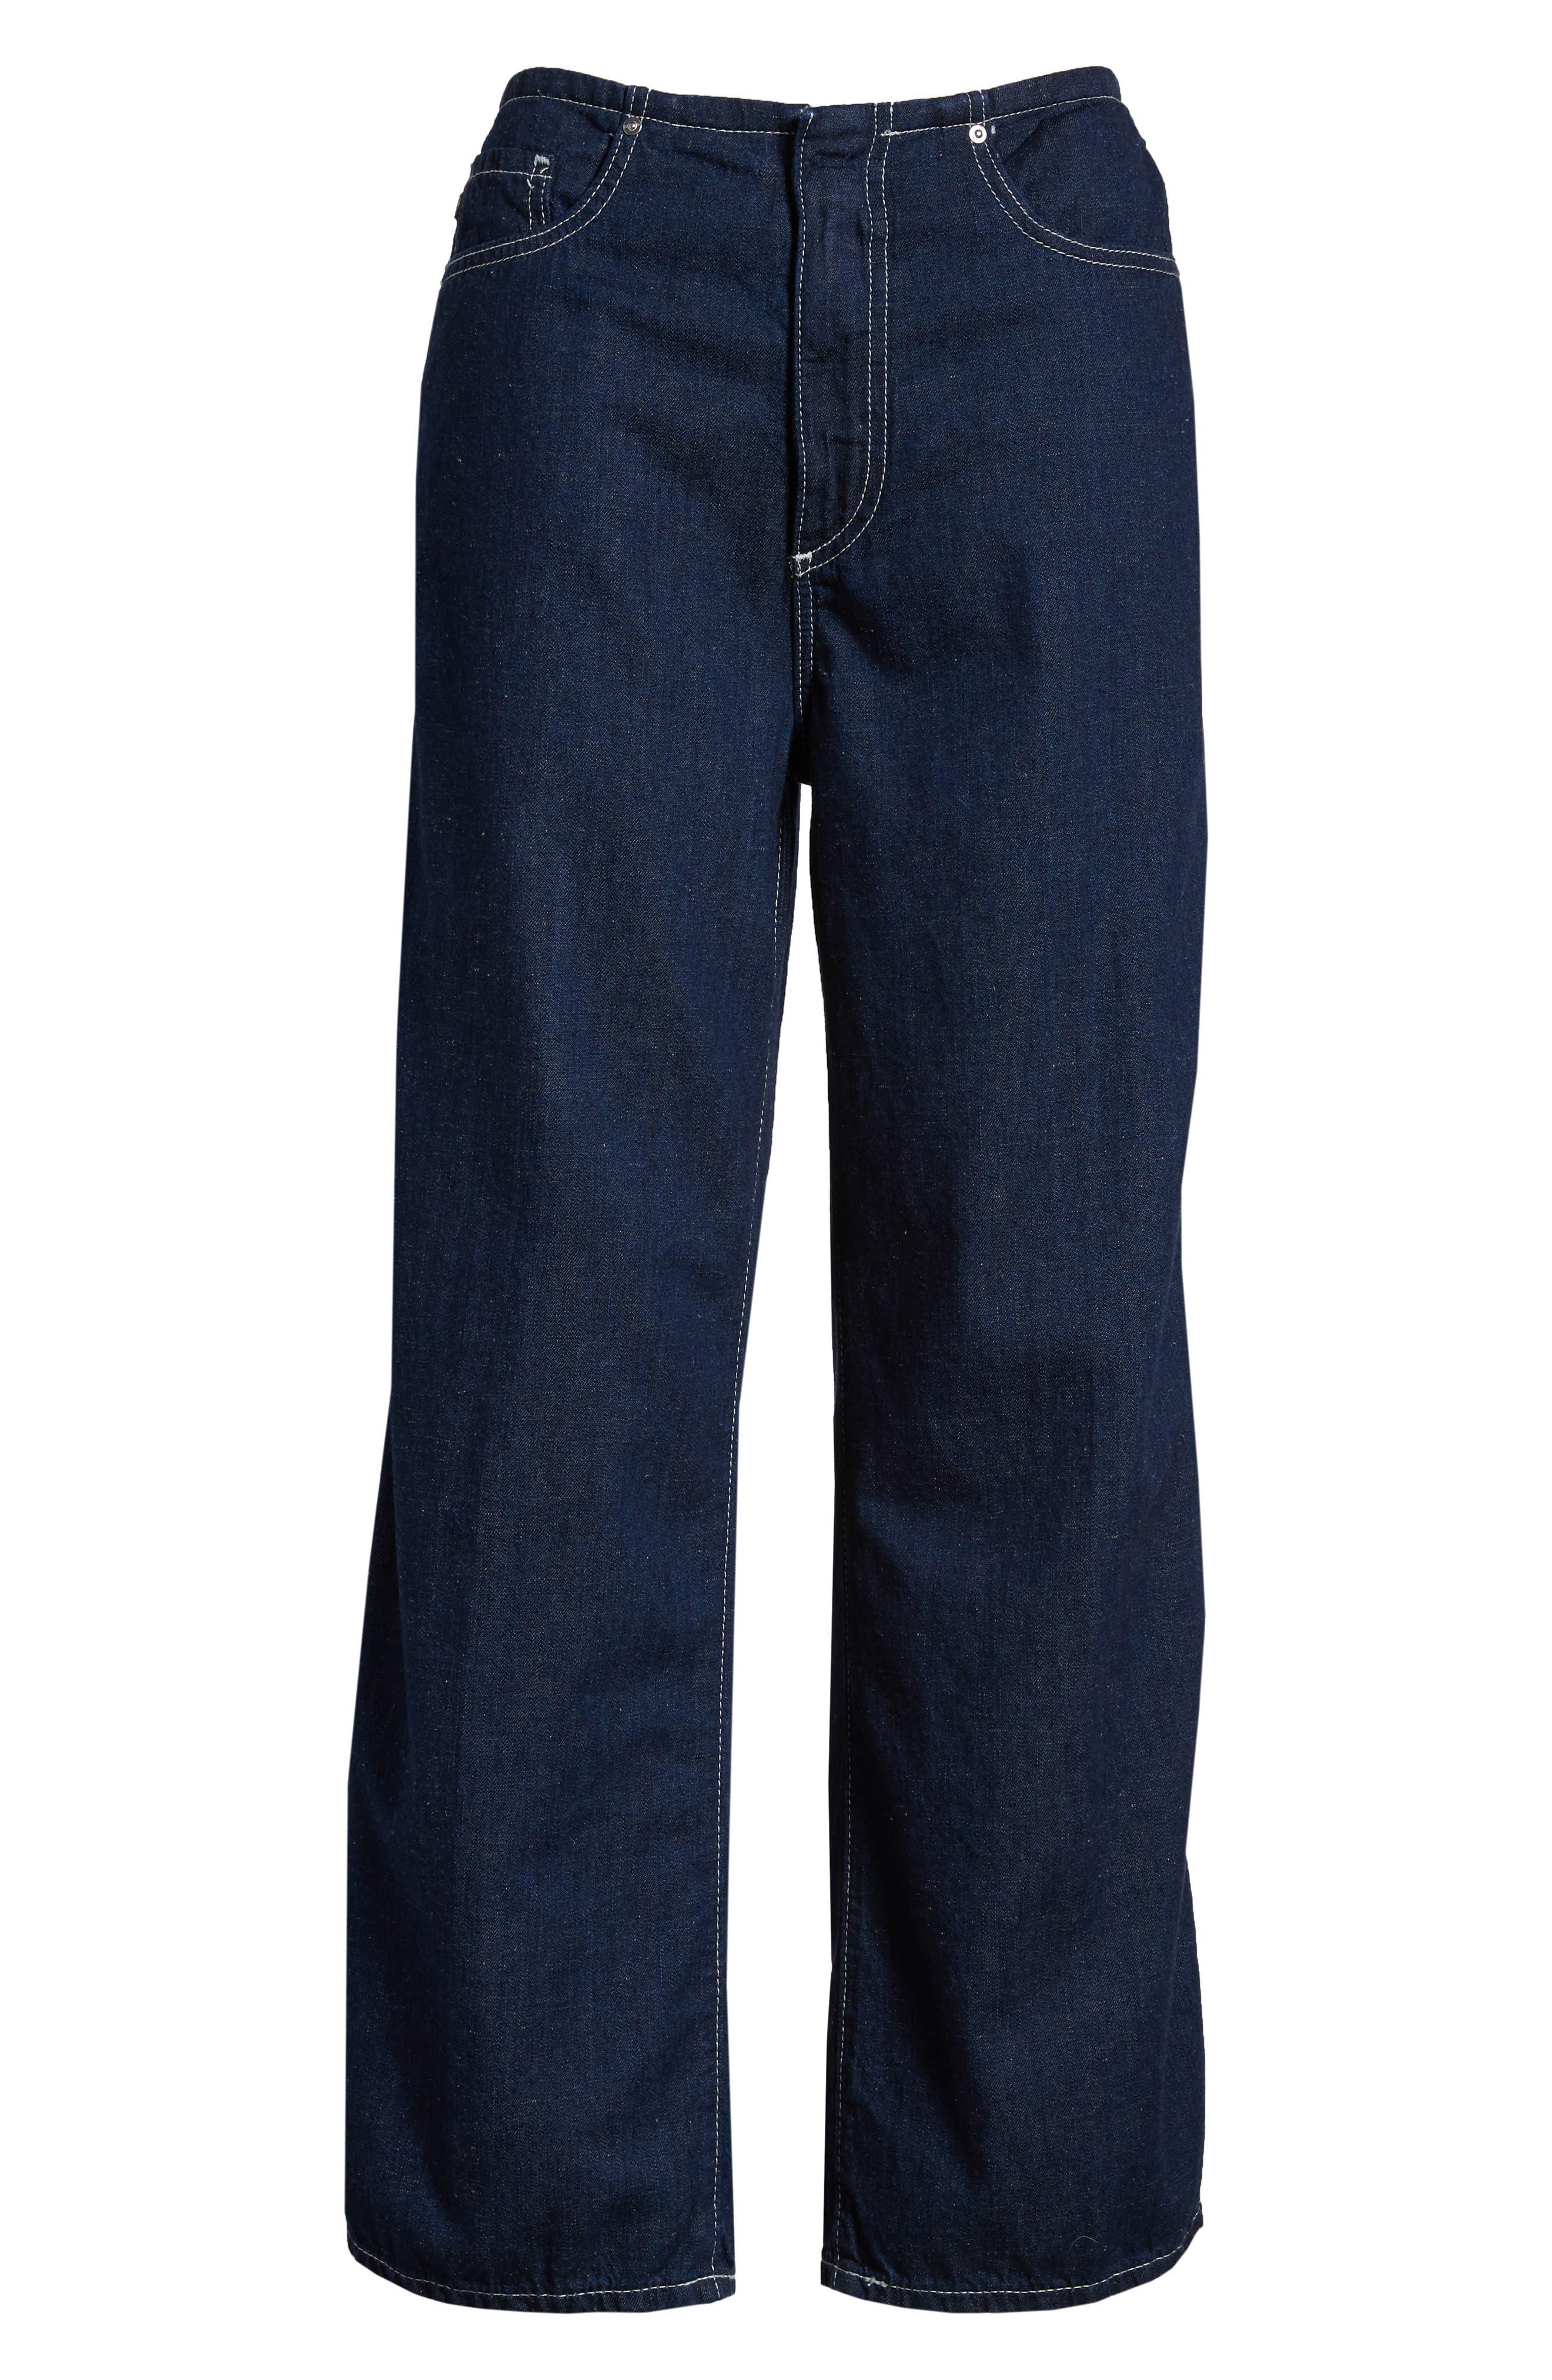 Etta High Waist Crop Wide Leg Jeans,                             Alternate thumbnail 6, color,                             Midnight Surge